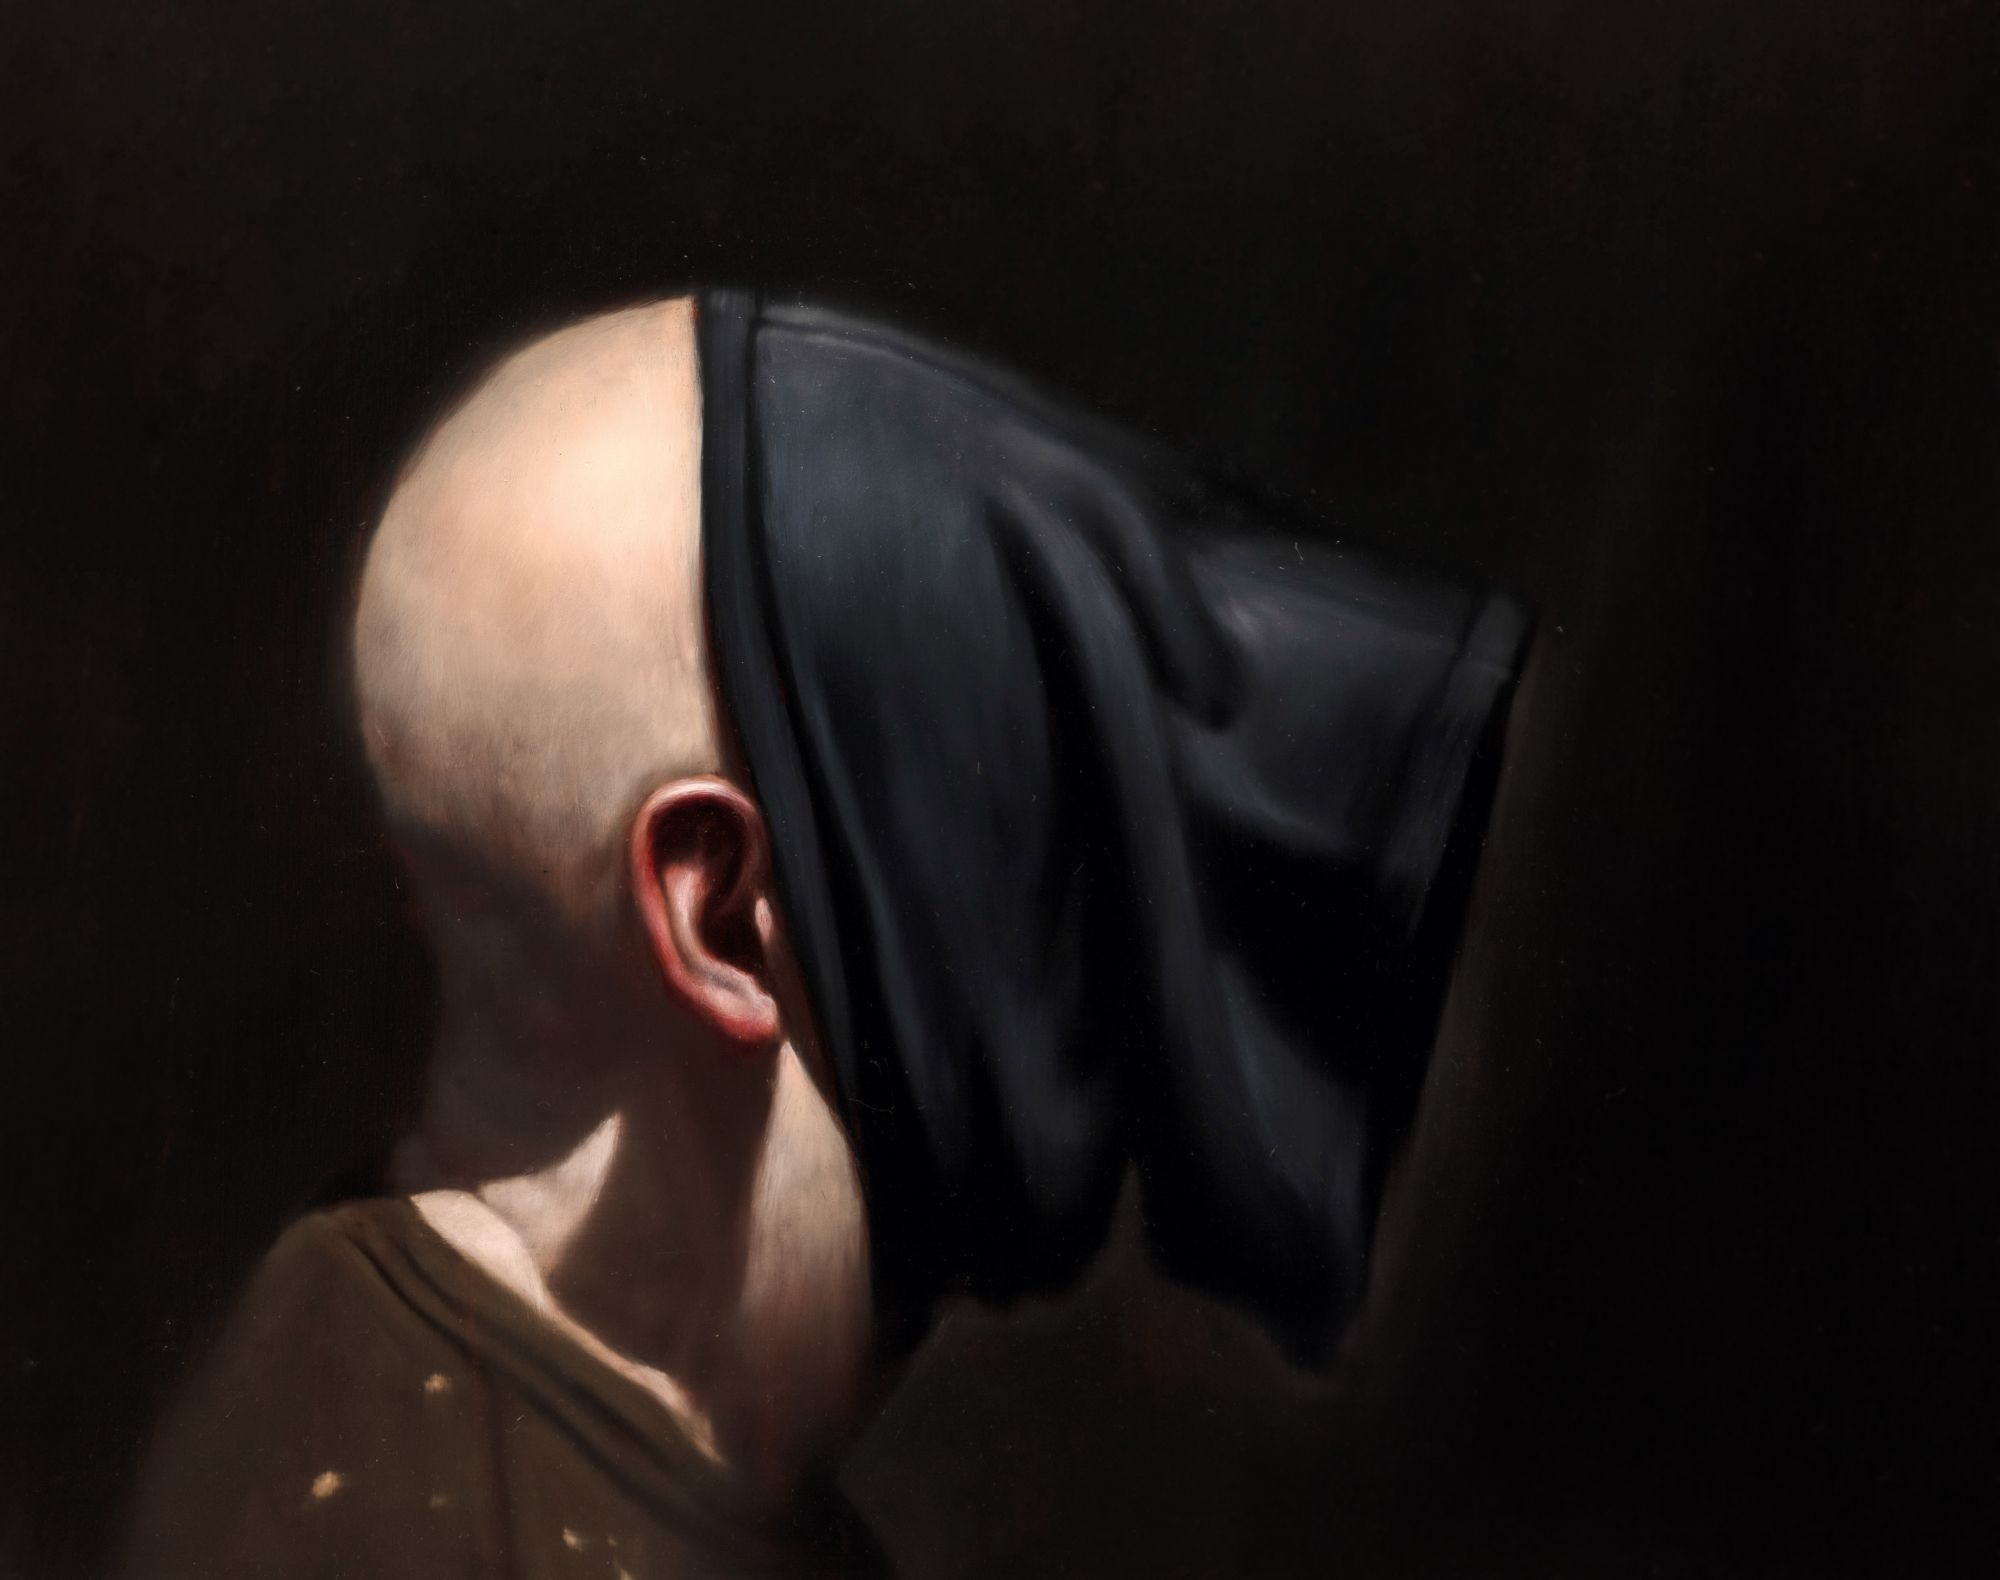 David Bowie也收藏他的作品!蘇格蘭藝術家Ken Currie以暗黑風格畫作探討人類的脆弱